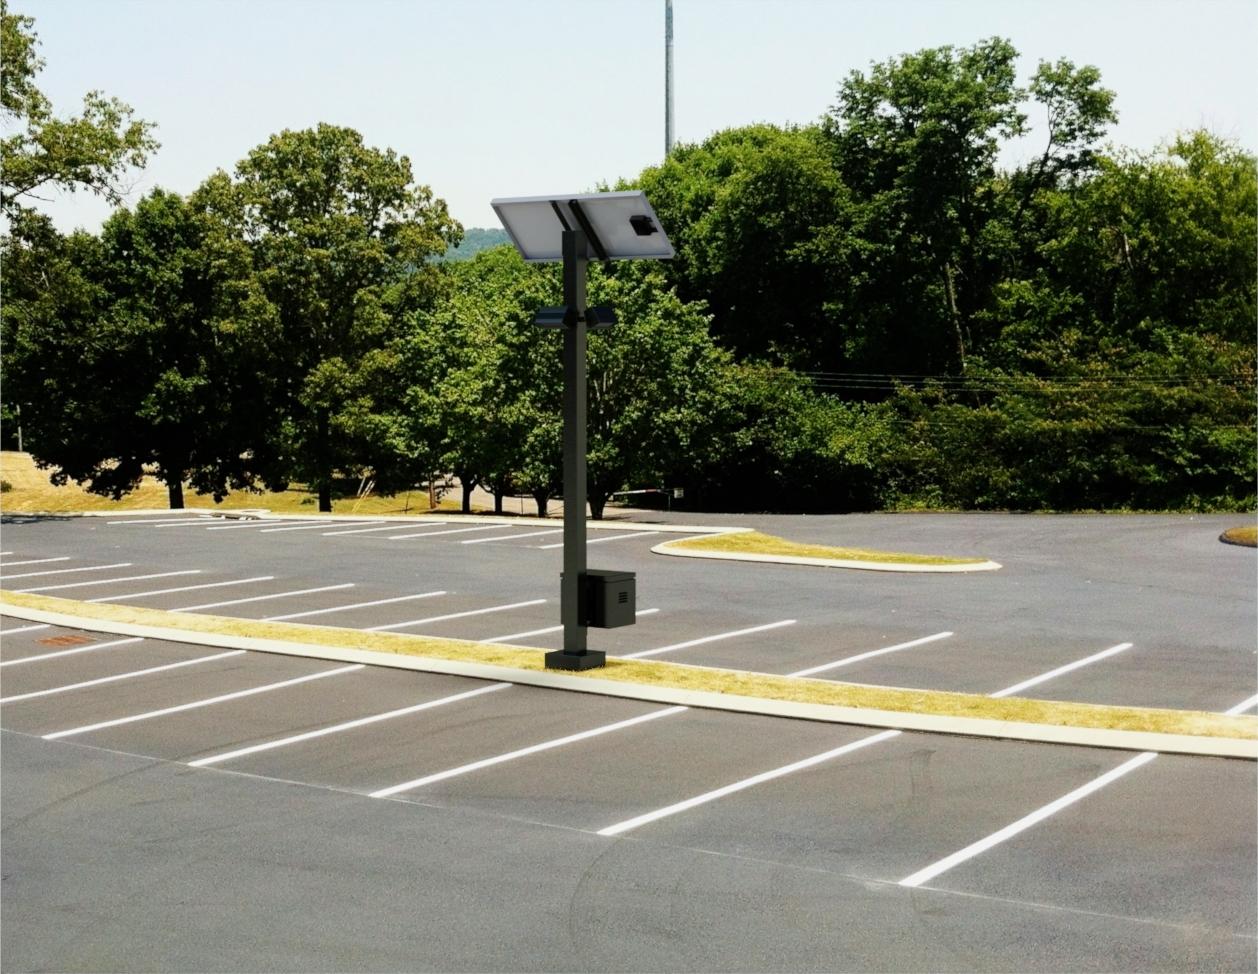 FFLED13DC - PMETL-1, IS-80-90J, PS4-07-20D2 - Angle Mount (Parking Lot).jpg